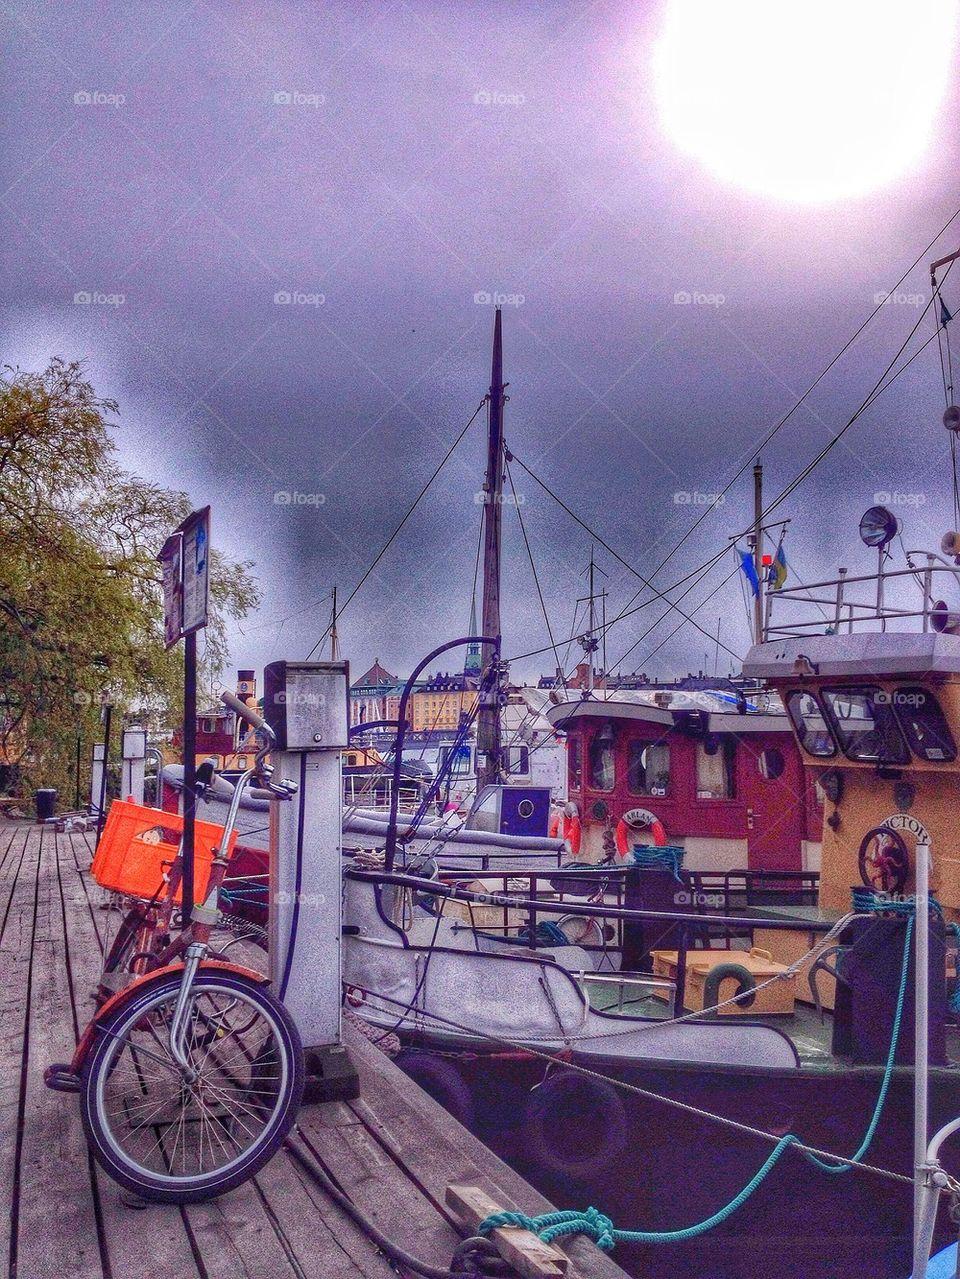 Bike at the dock